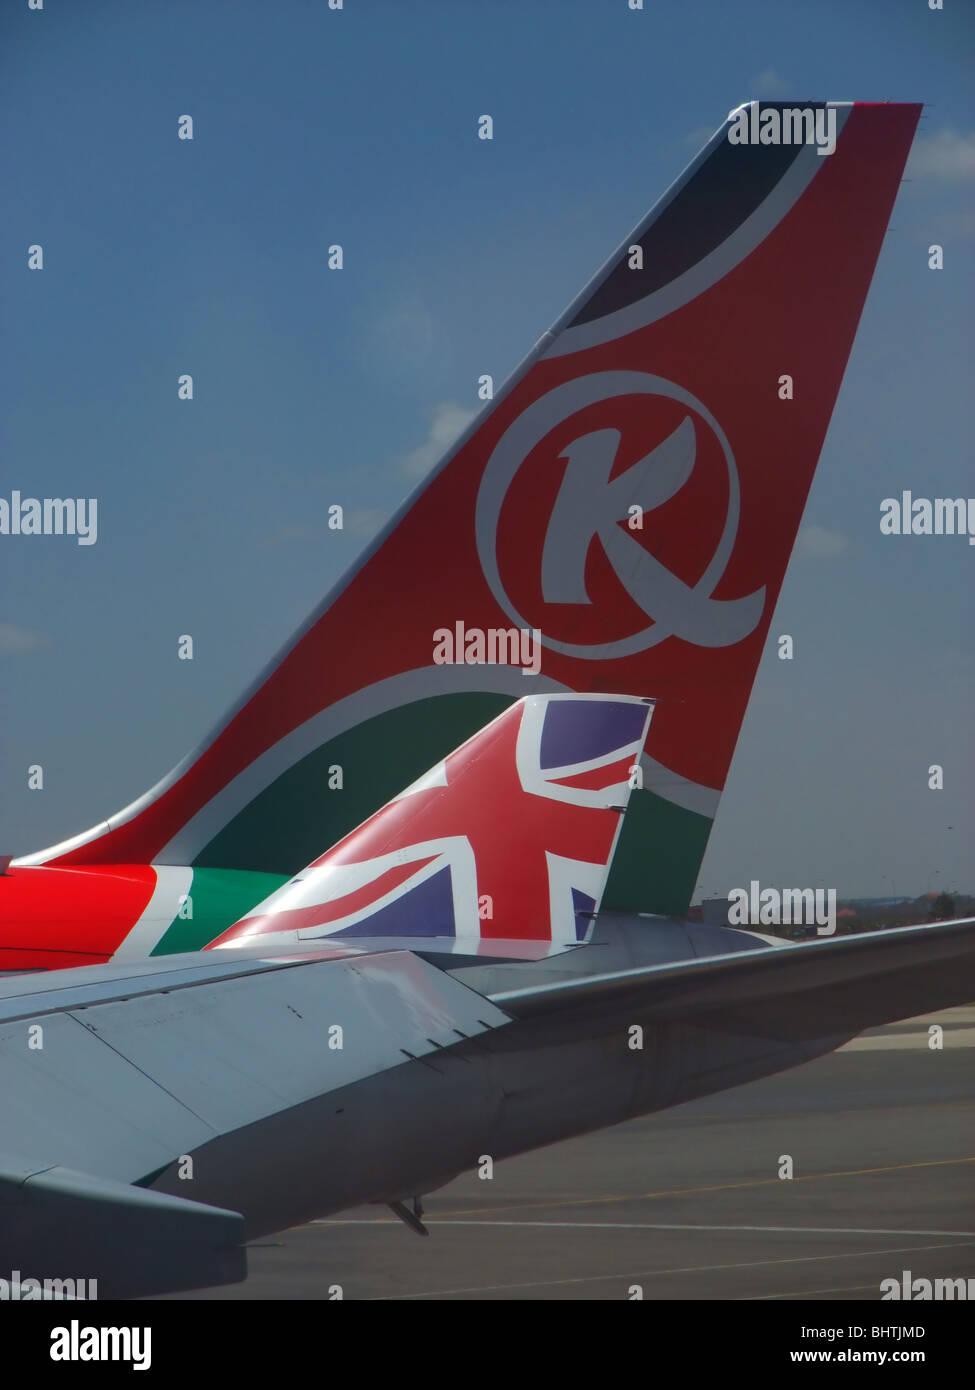 airplane winglet - Stock Image